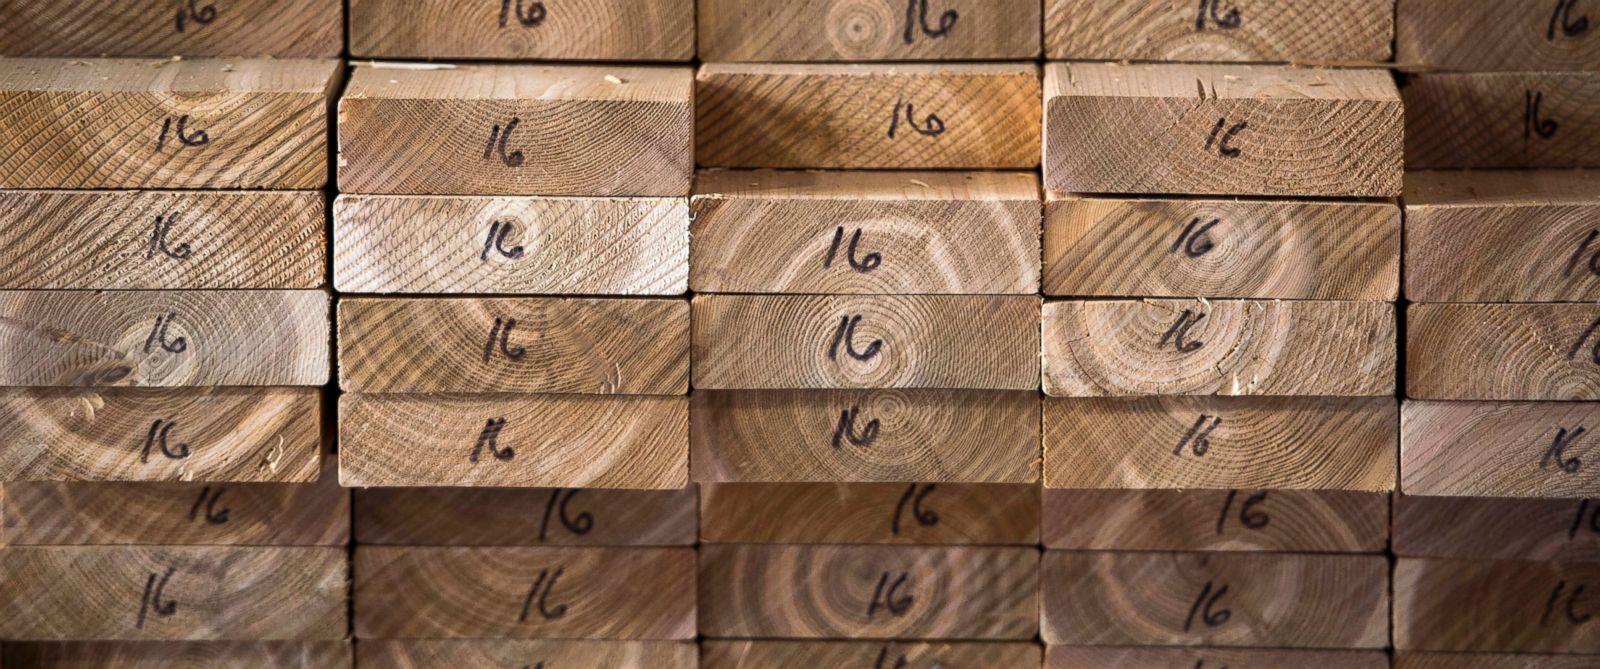 AP-canada-lumber-jef-170425_12x5_1600_1493151393227.jpg